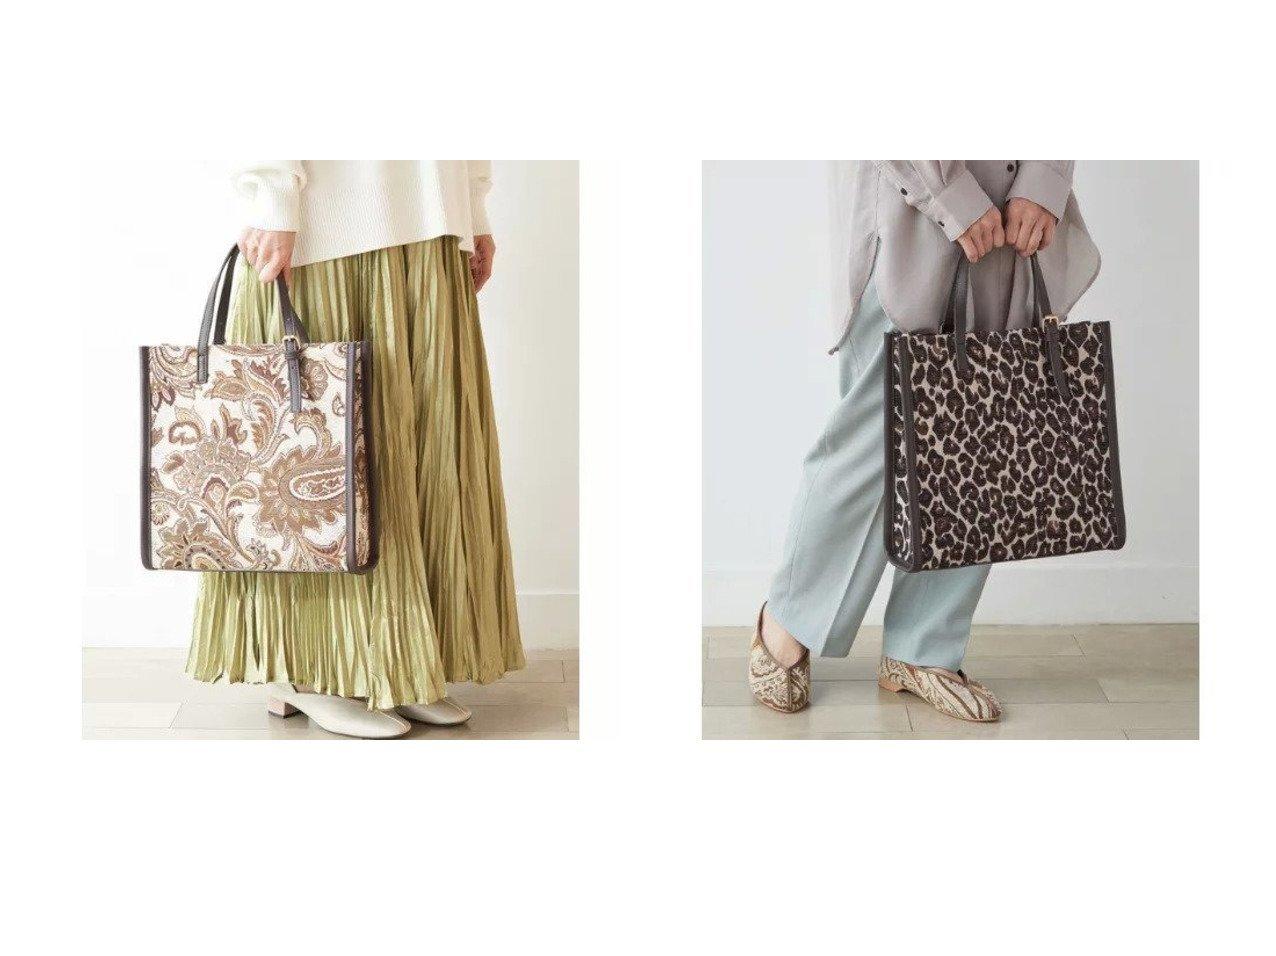 【Rope Picnic/ロペピクニック】のジャガードコンビバックルハンドルトート&ショルダーバッグ バッグ・鞄のおすすめ!人気、トレンド・レディースファッションの通販 おすすめで人気の流行・トレンド、ファッションの通販商品 メンズファッション・キッズファッション・インテリア・家具・レディースファッション・服の通販 founy(ファニー) https://founy.com/ ファッション Fashion レディースファッション WOMEN バッグ Bag ペイズリー ポケット レオパード  ID:crp329100000016352